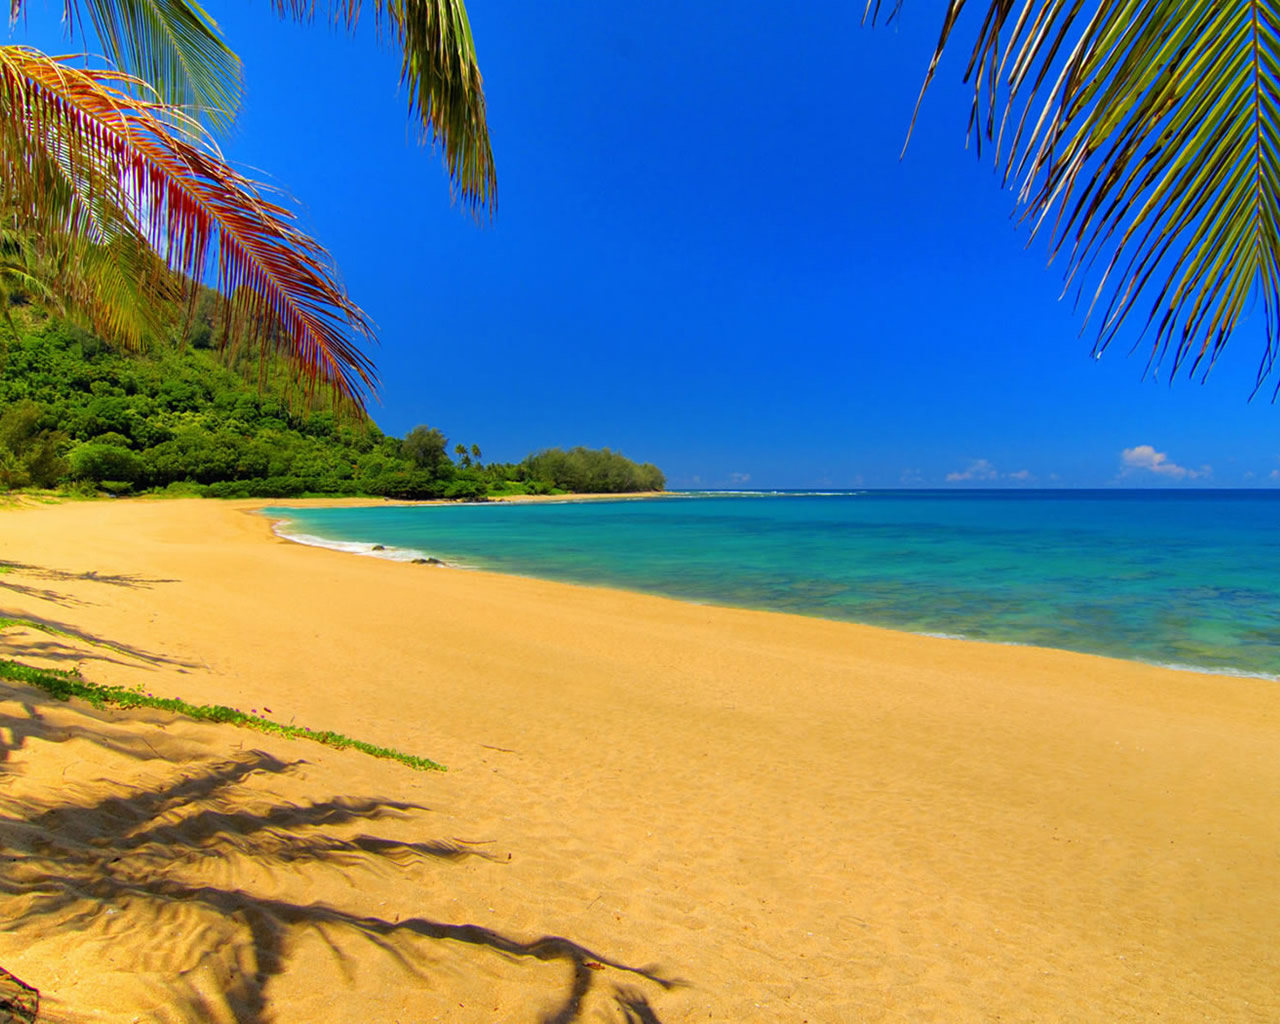 summer beach scenes wallpaper With Resolutions 12801024 Pixel 1280x1024